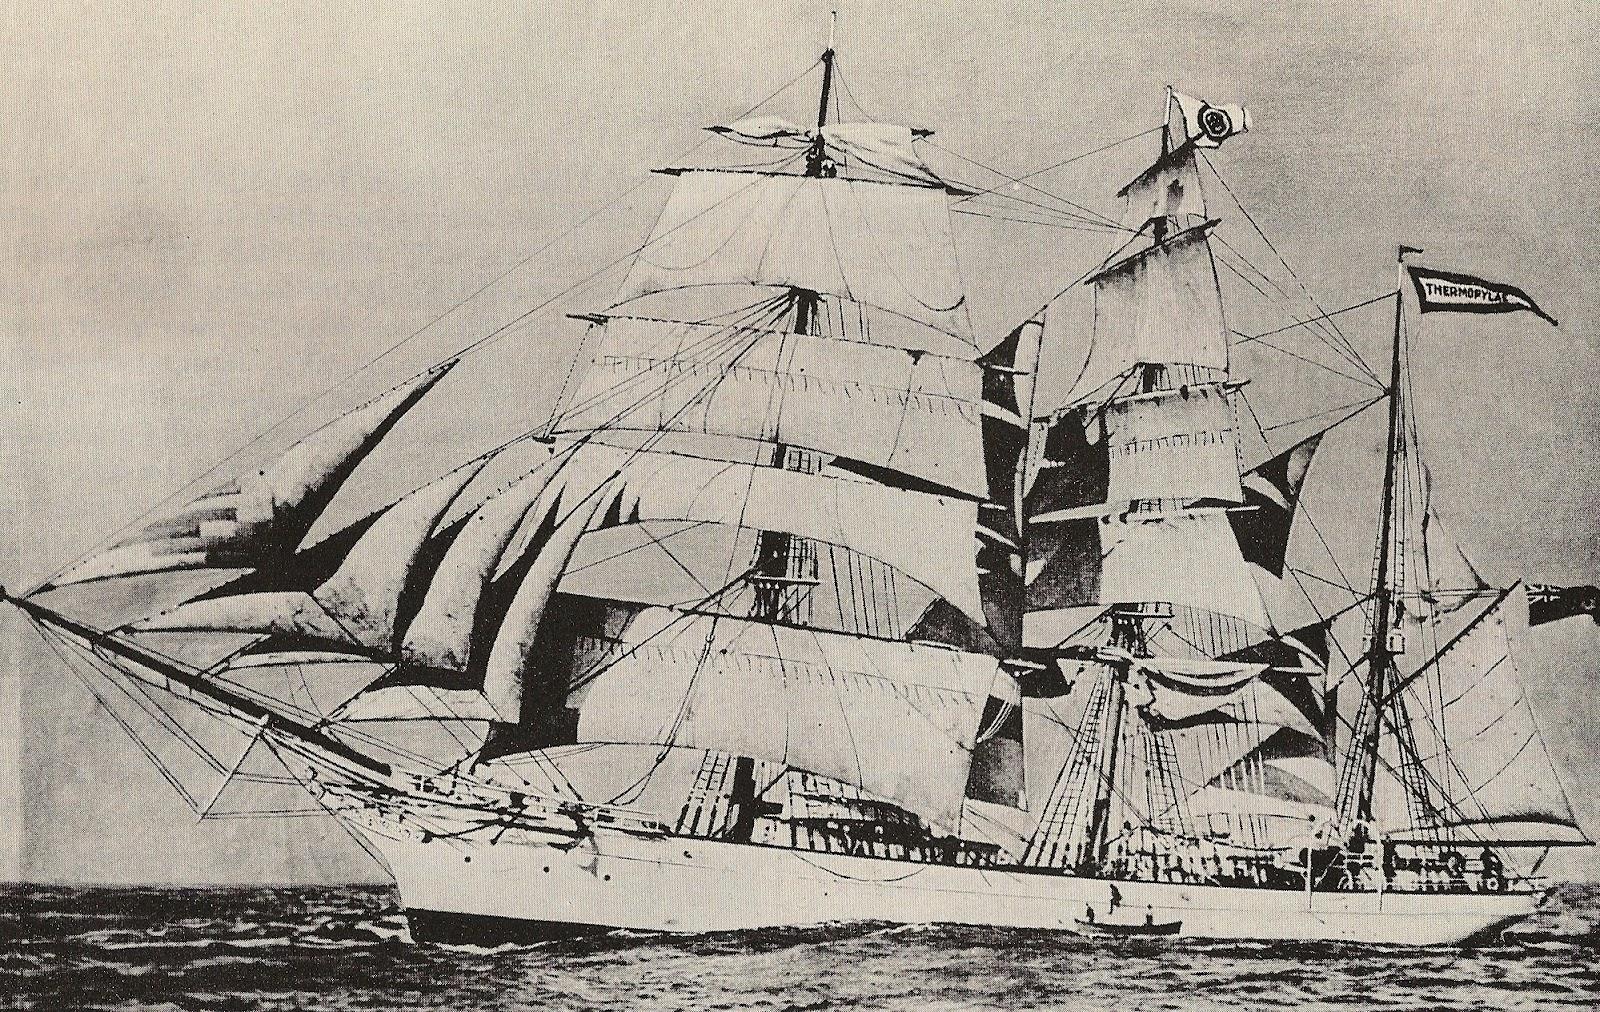 Victoria BC CANADA 1983 Trade DOLLAR Token with Fast Clipper Ship Thermopylae